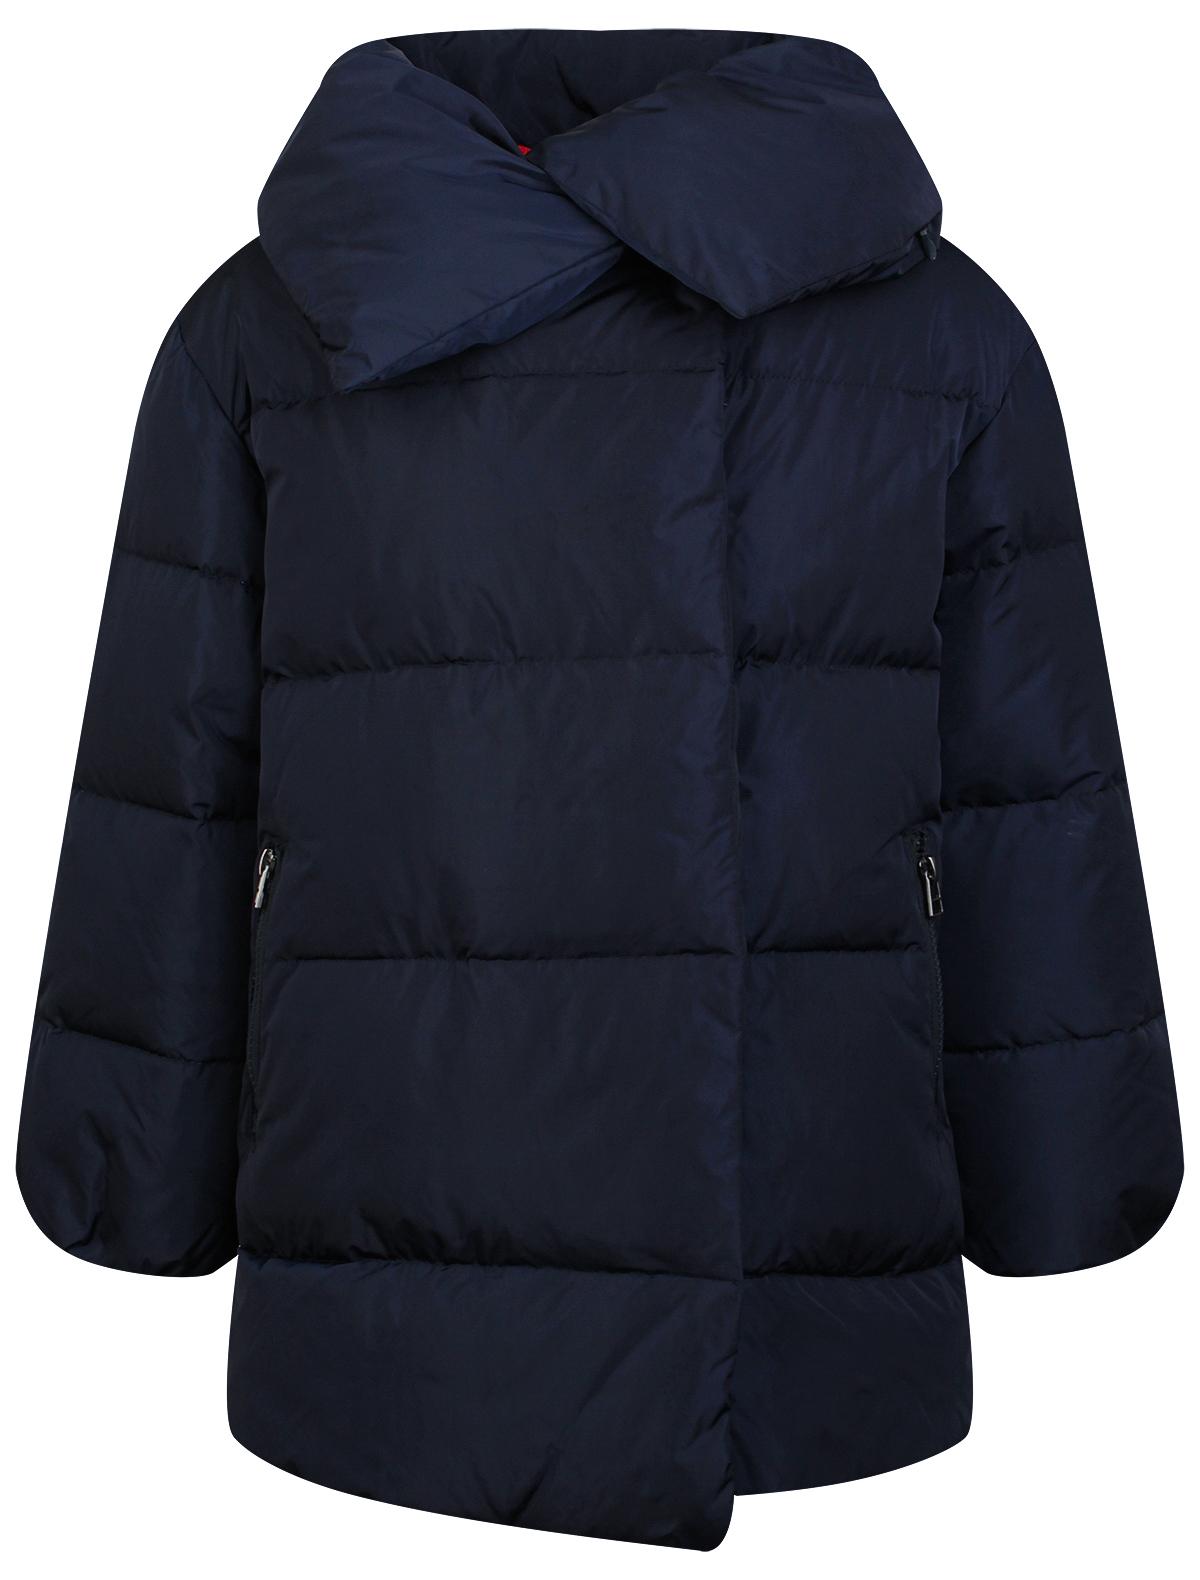 Купить 2118795, Куртка FREEDOMDAY, синий, Женский, 1071409980223